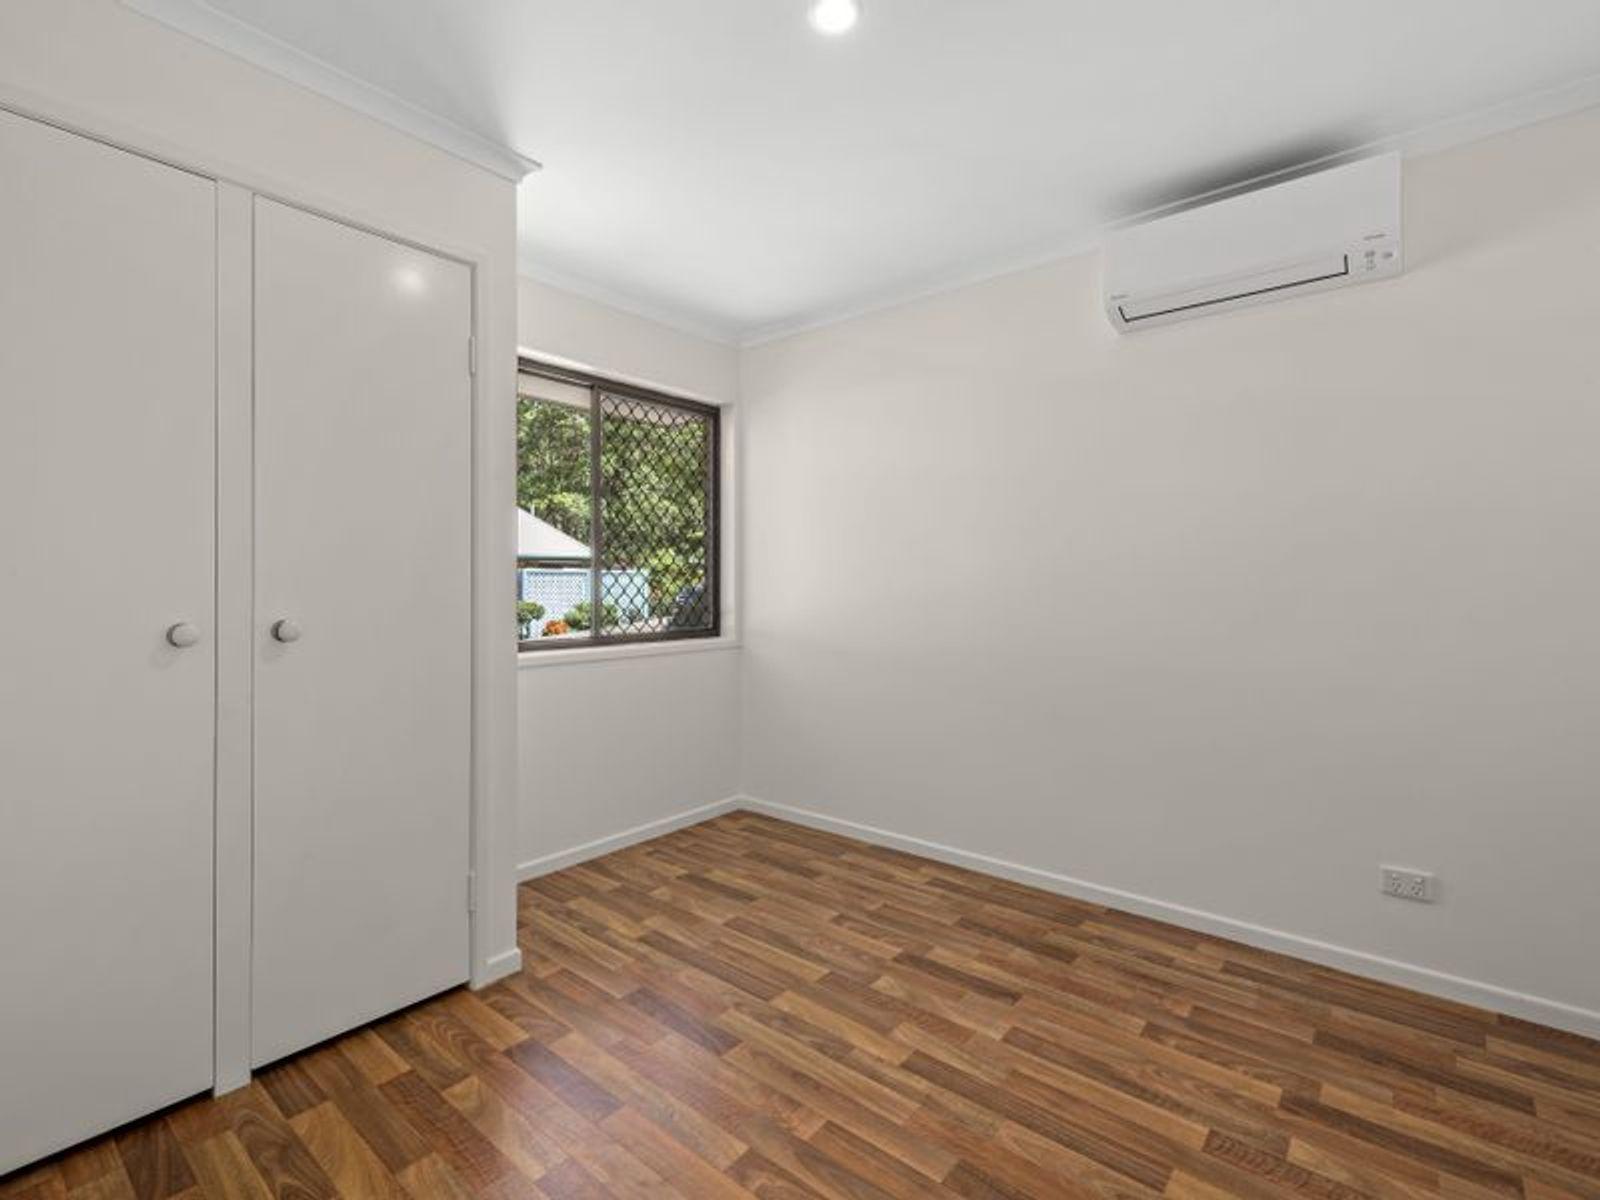 57/18 Doolan Street, Nambour, QLD 4560